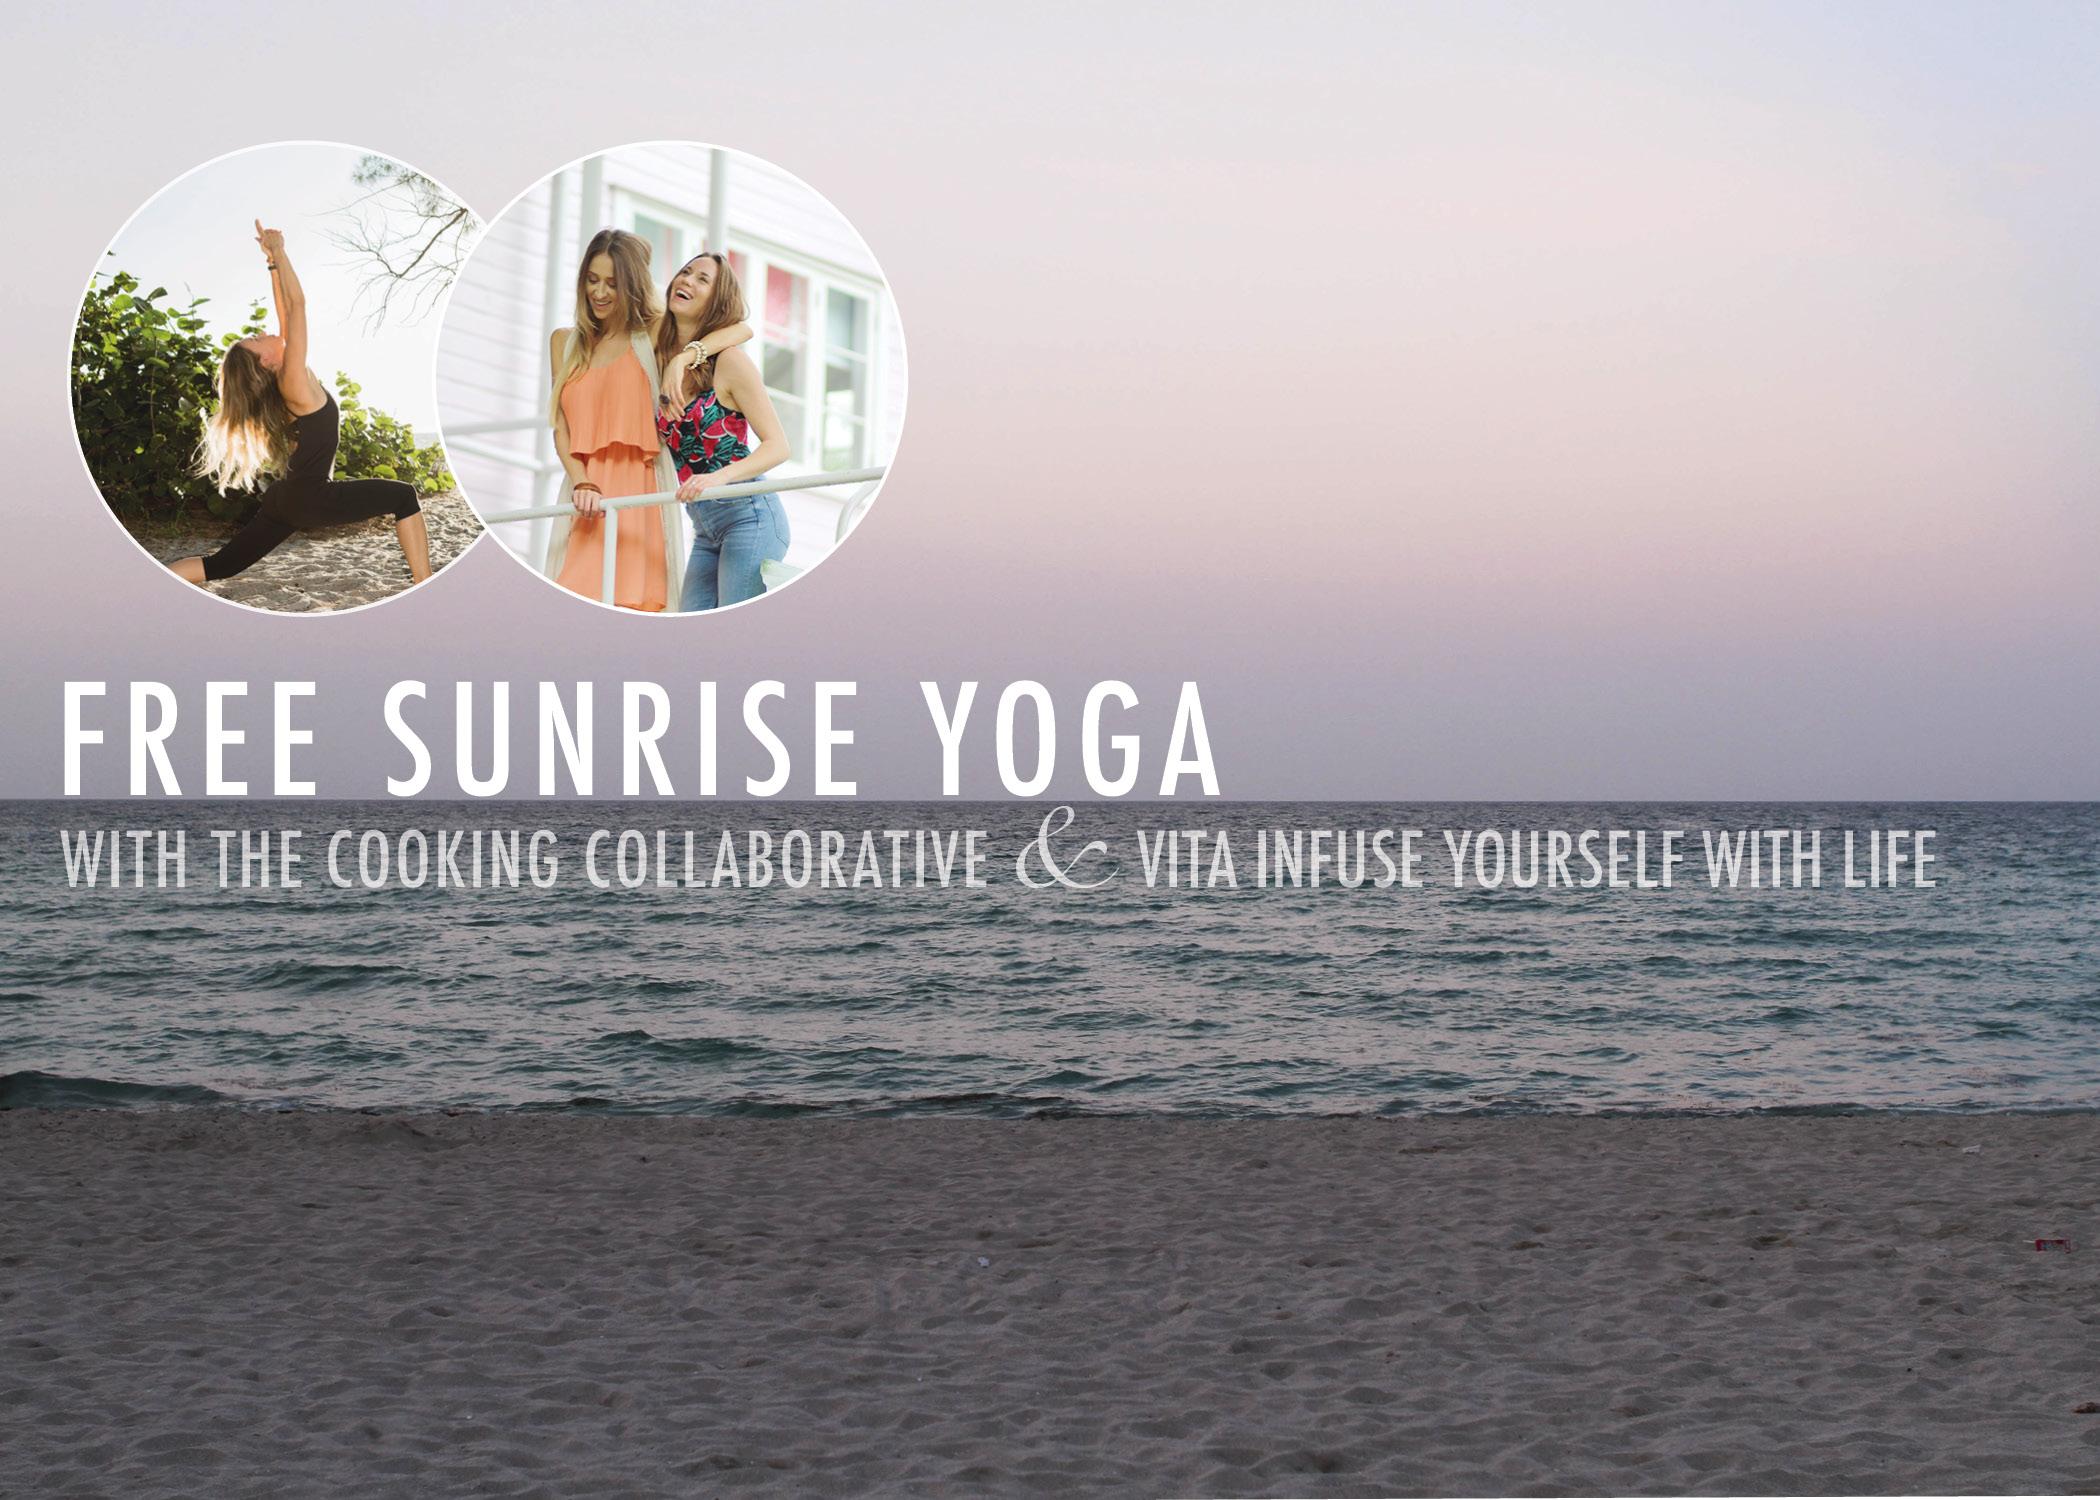 Free Sunrise Yoga.jpg